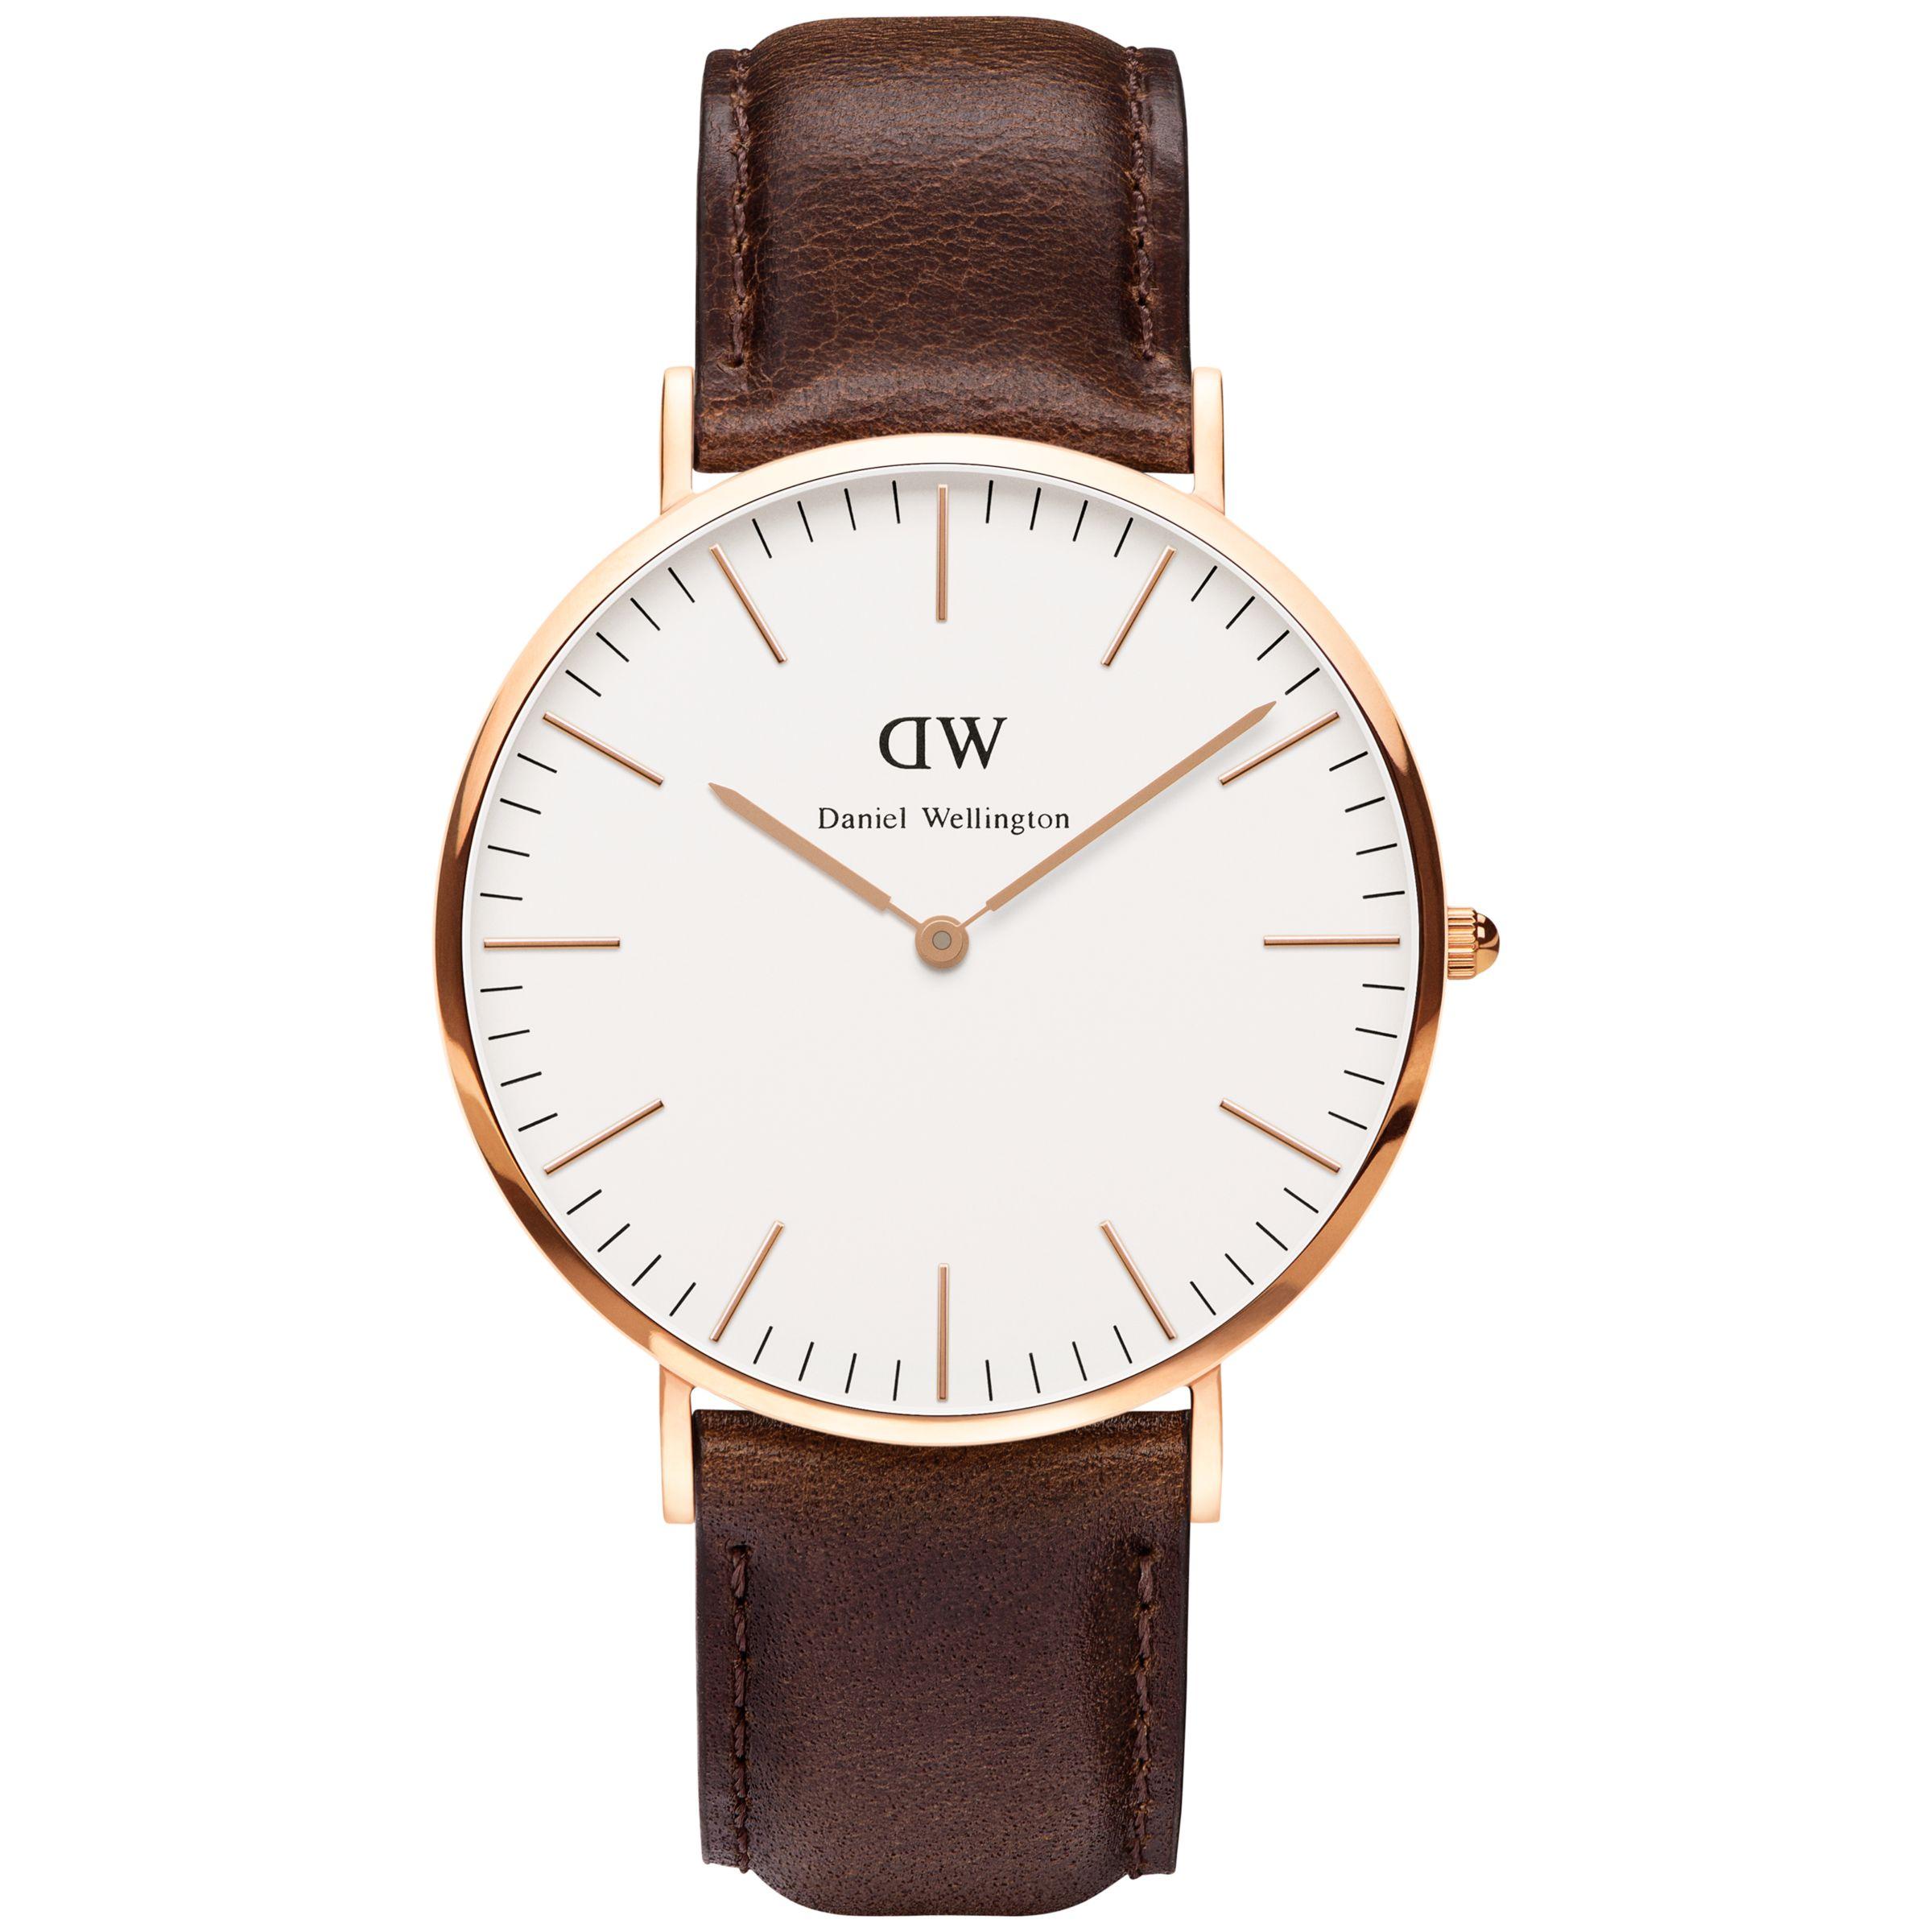 Daniel Wellington Daniel Wellington 0109DW Men's Classy Rose Gold Plated Leather Strap Watch, Brown/White